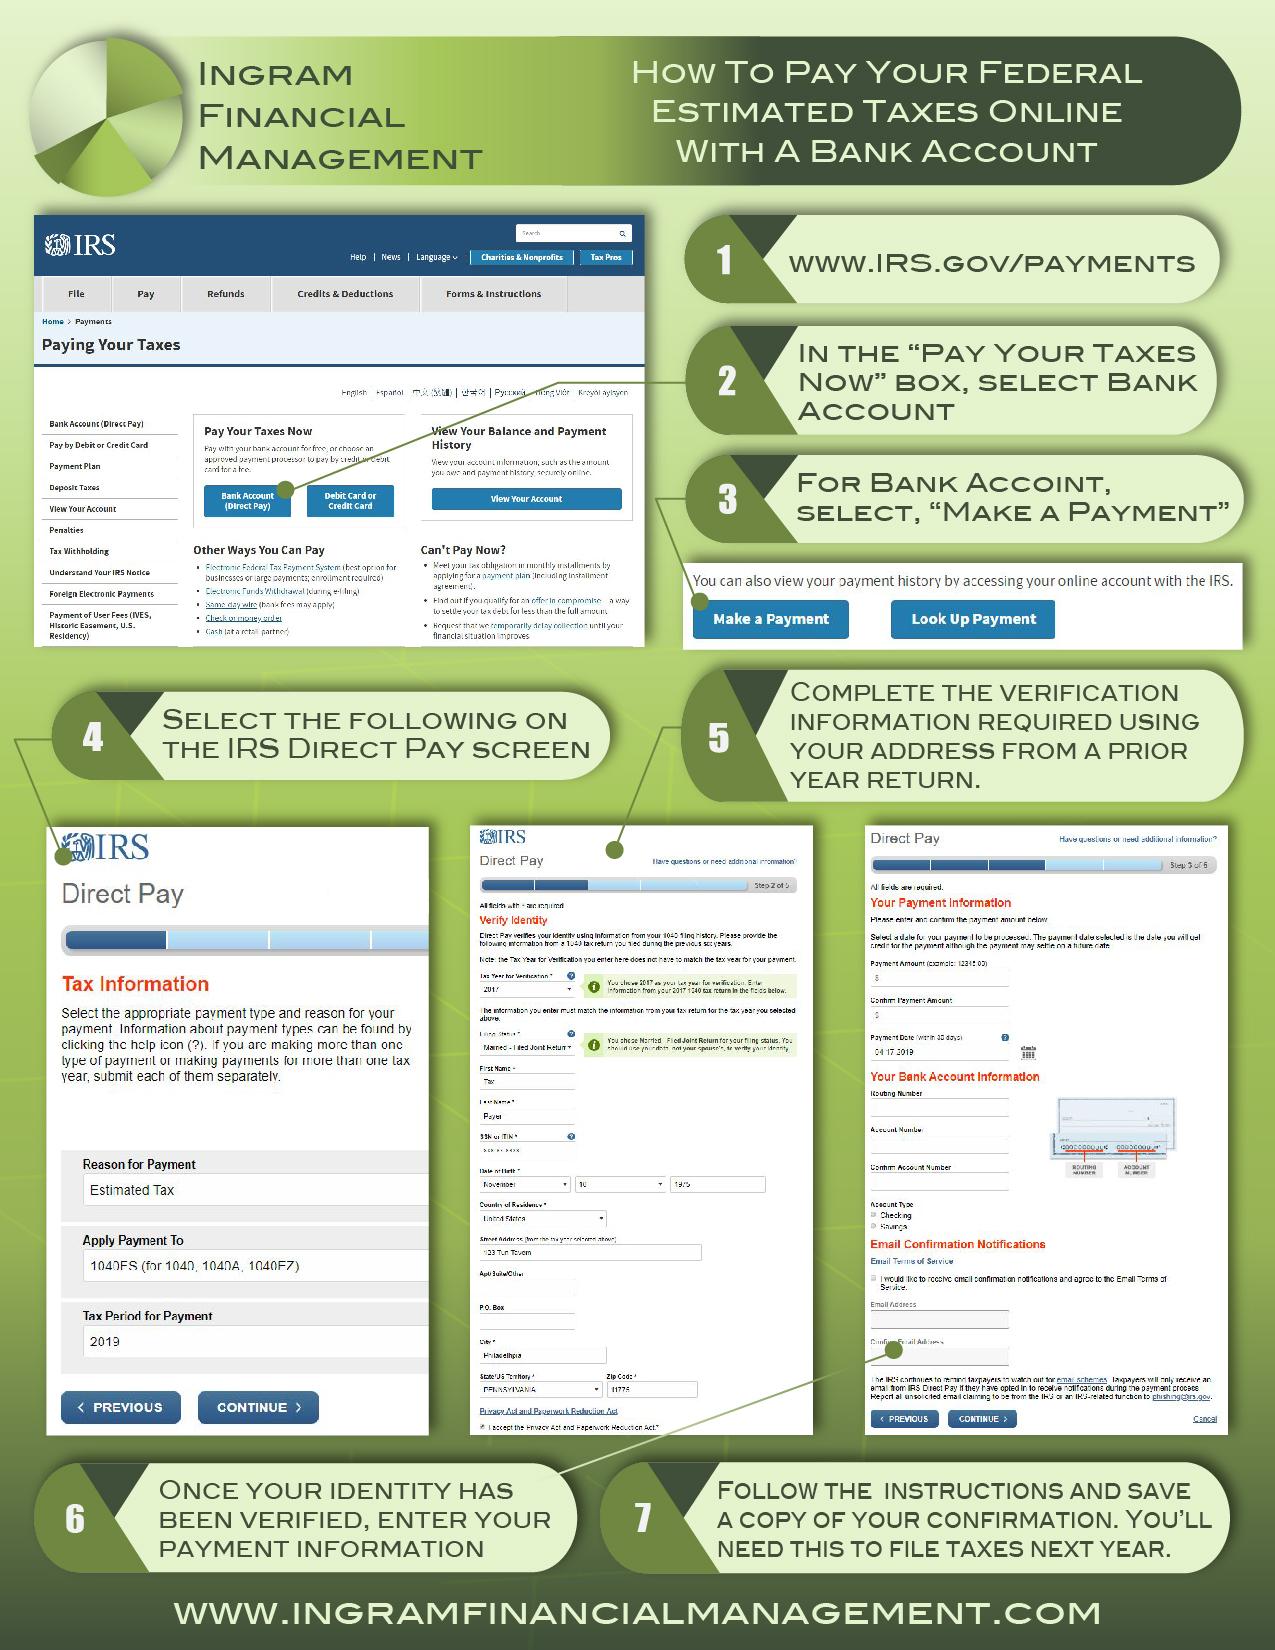 Ingram Financial Management Online Estimated Tax Payments